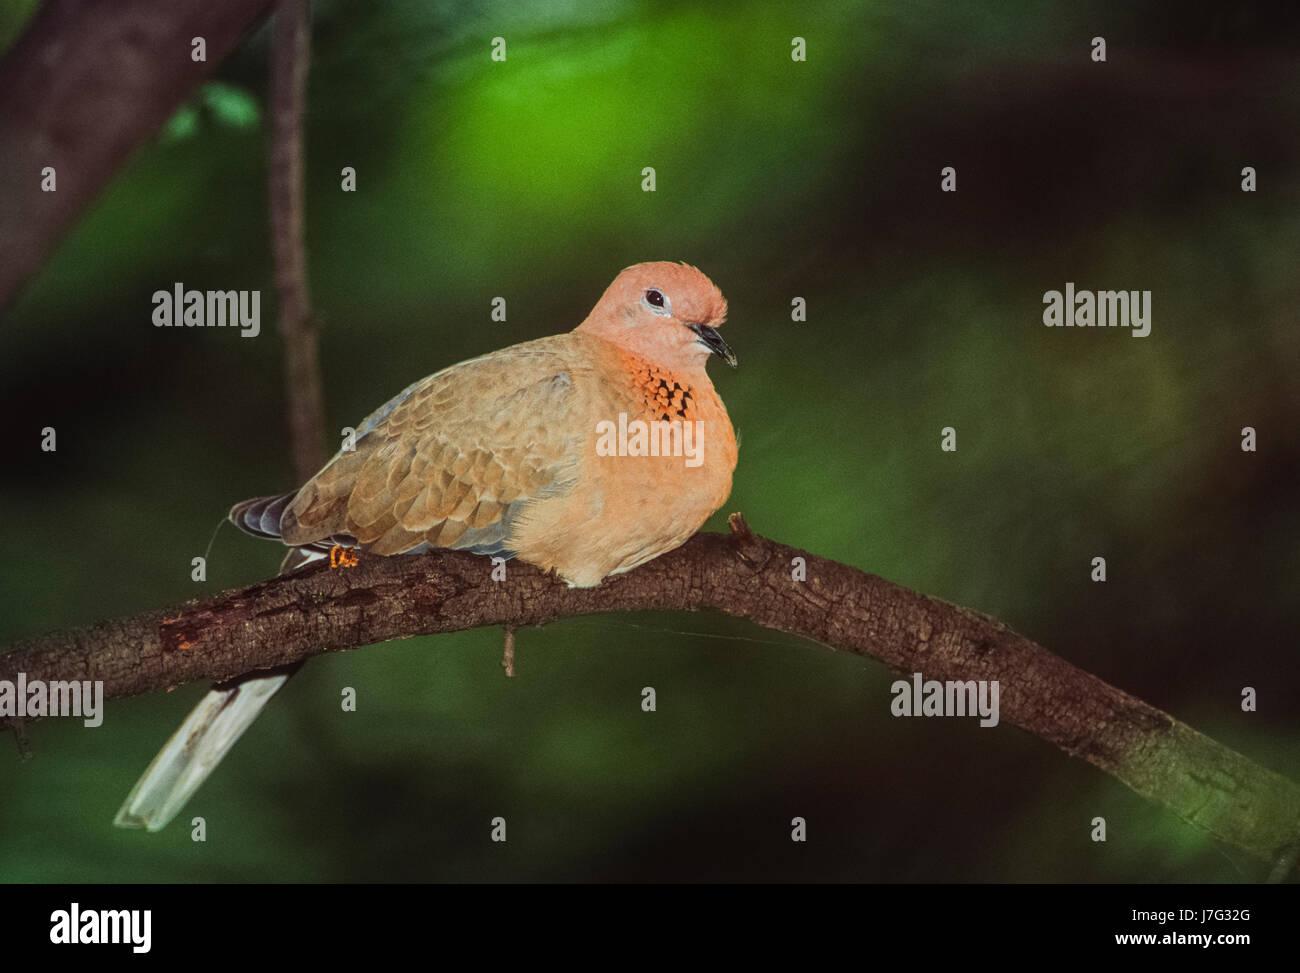 Laughing Dove, (Spilopelia senegalensis), Keoladeo Ghana National Park, Bharatpur, Rajasthan, India - Stock Image